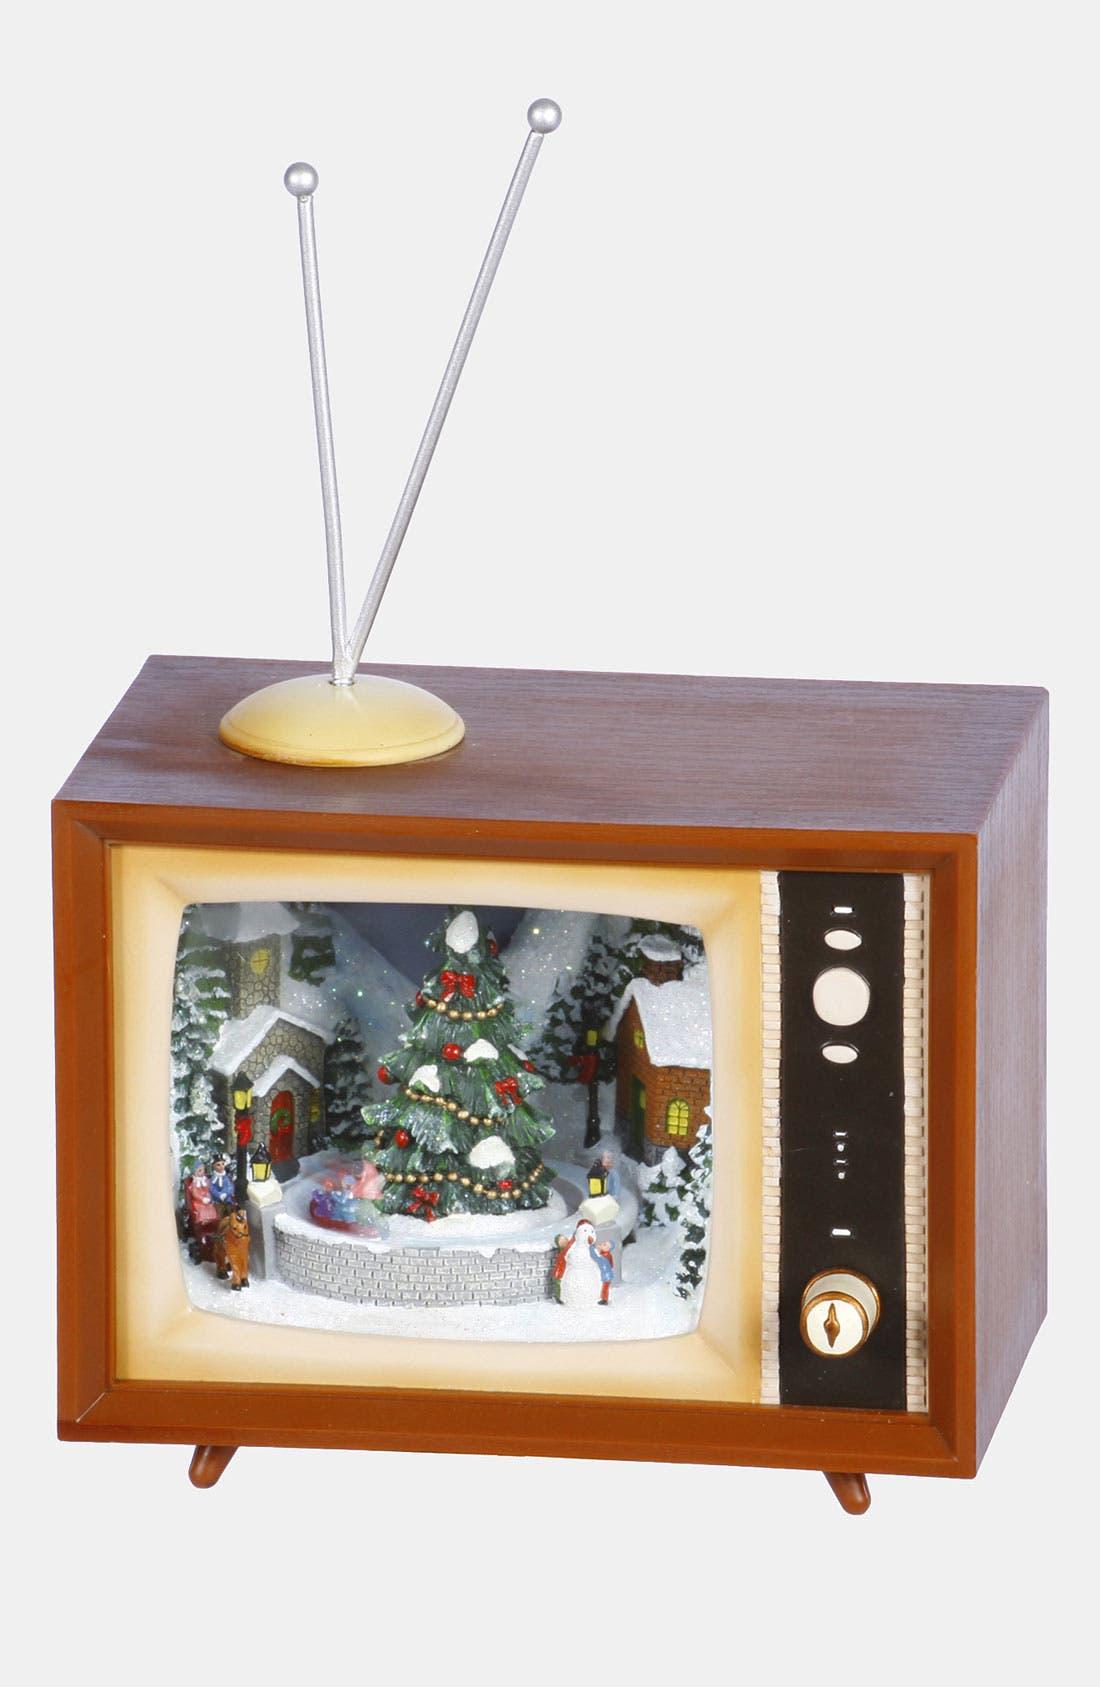 Alternate Image 1 Selected - Winward 'Mini TV - Square' Music Box